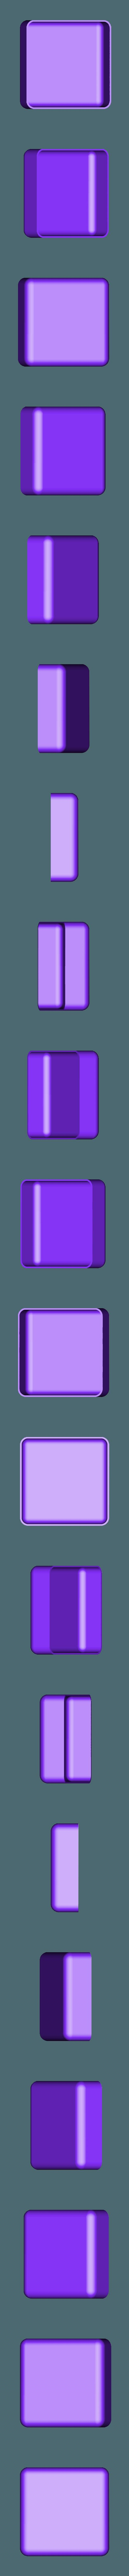 42mm_square.stl Download free SCAD file Customizable Square Trays • 3D printer design, WalterHsiao